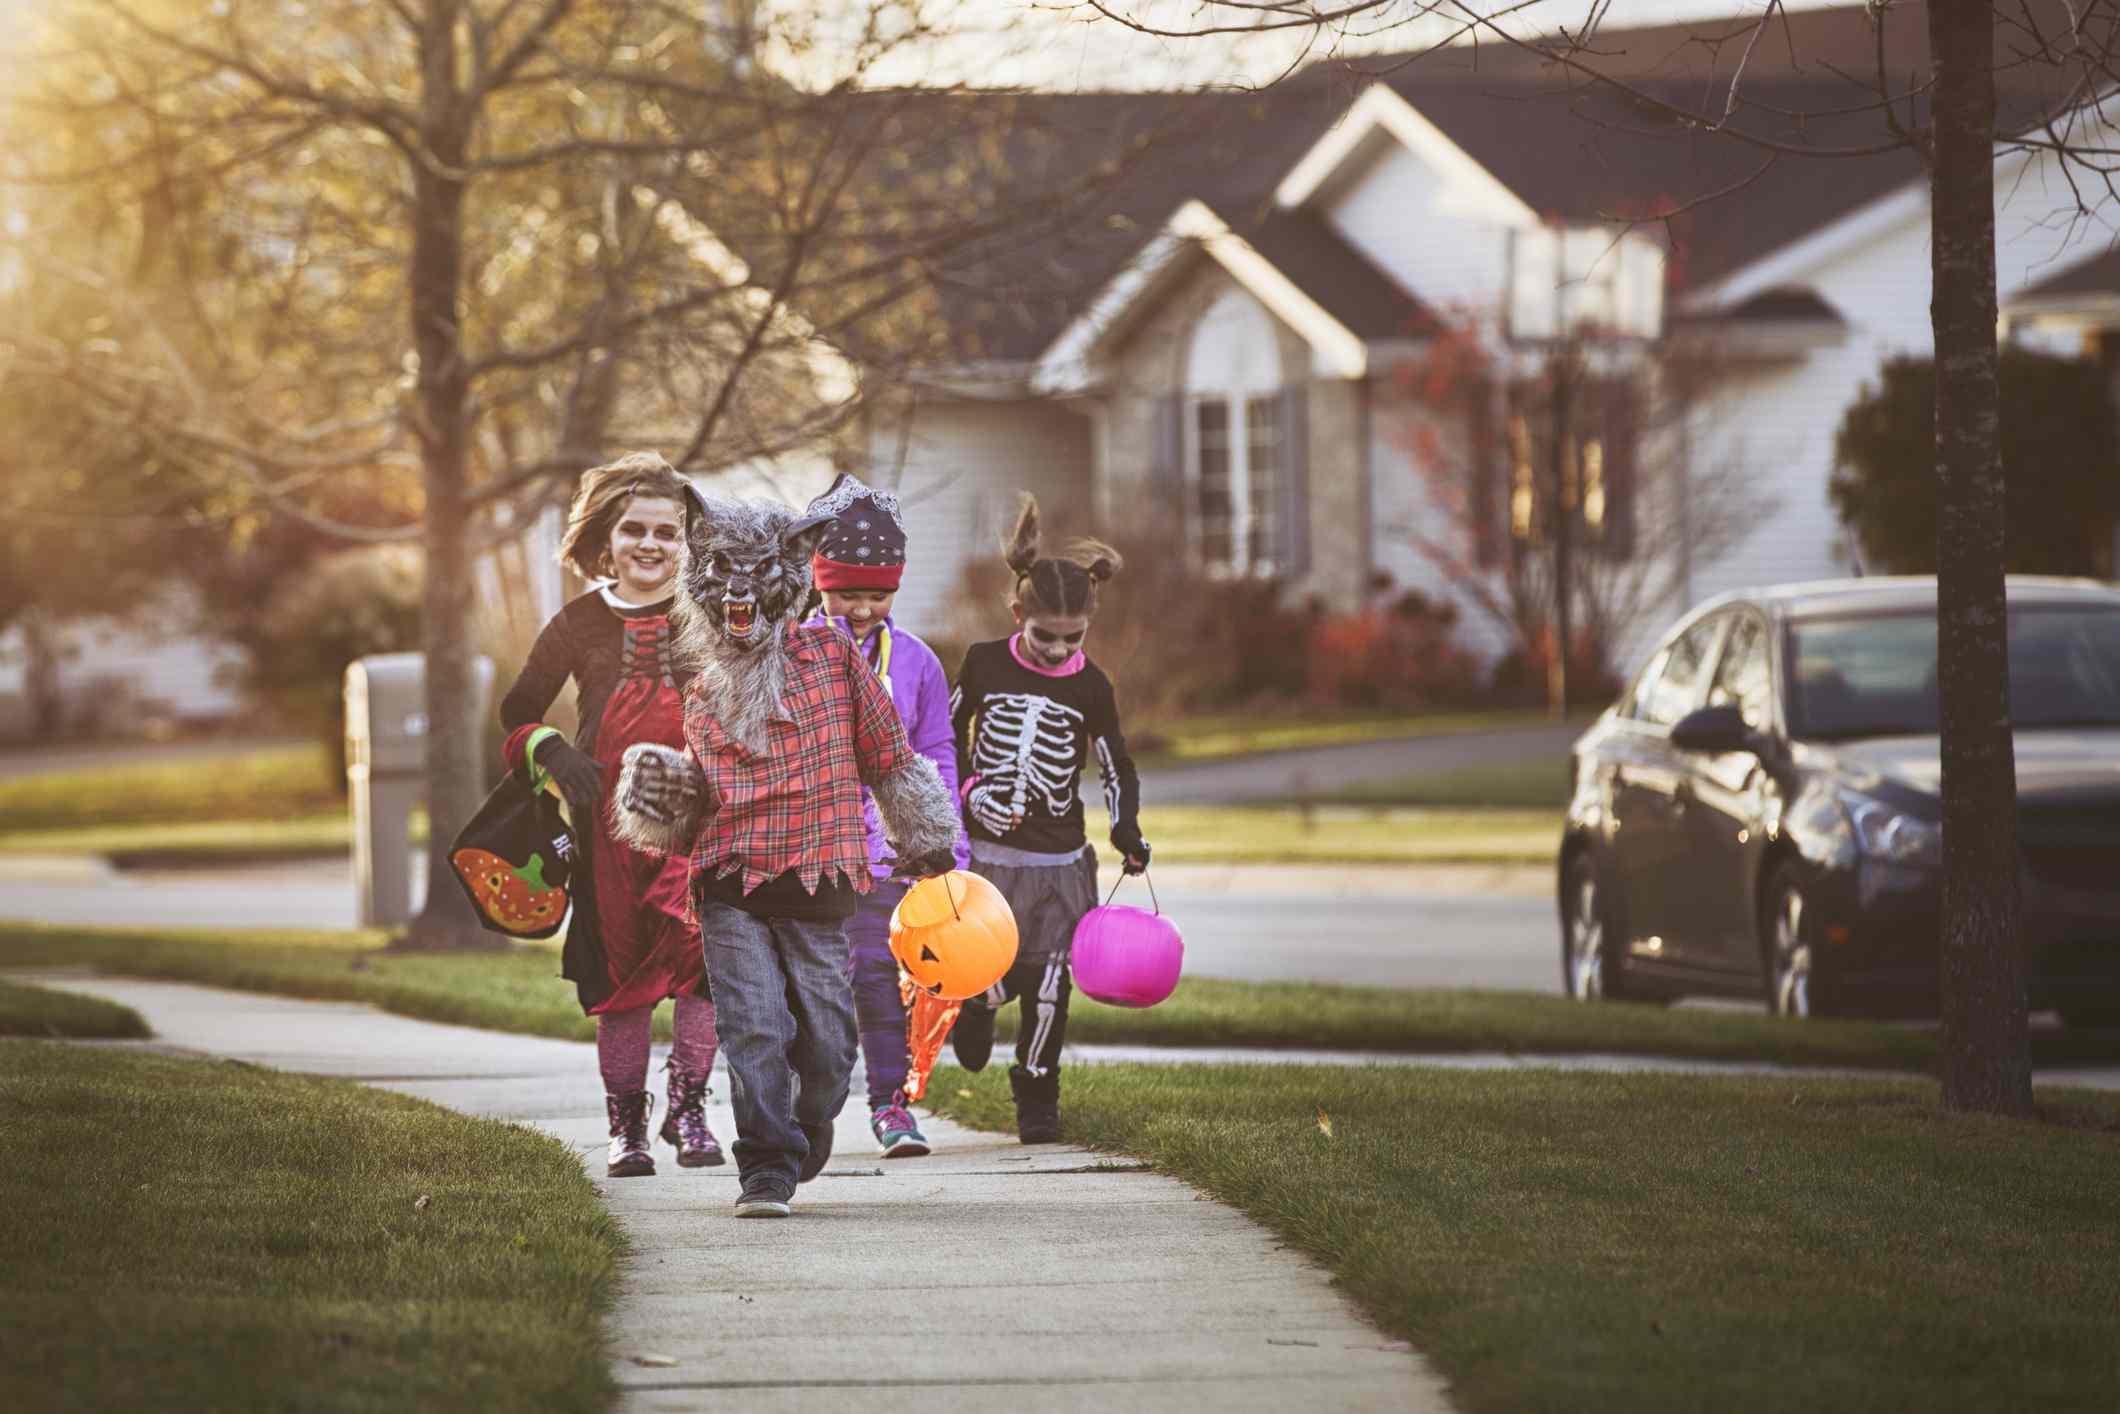 Children dressed in costumes walking on the sidewalk